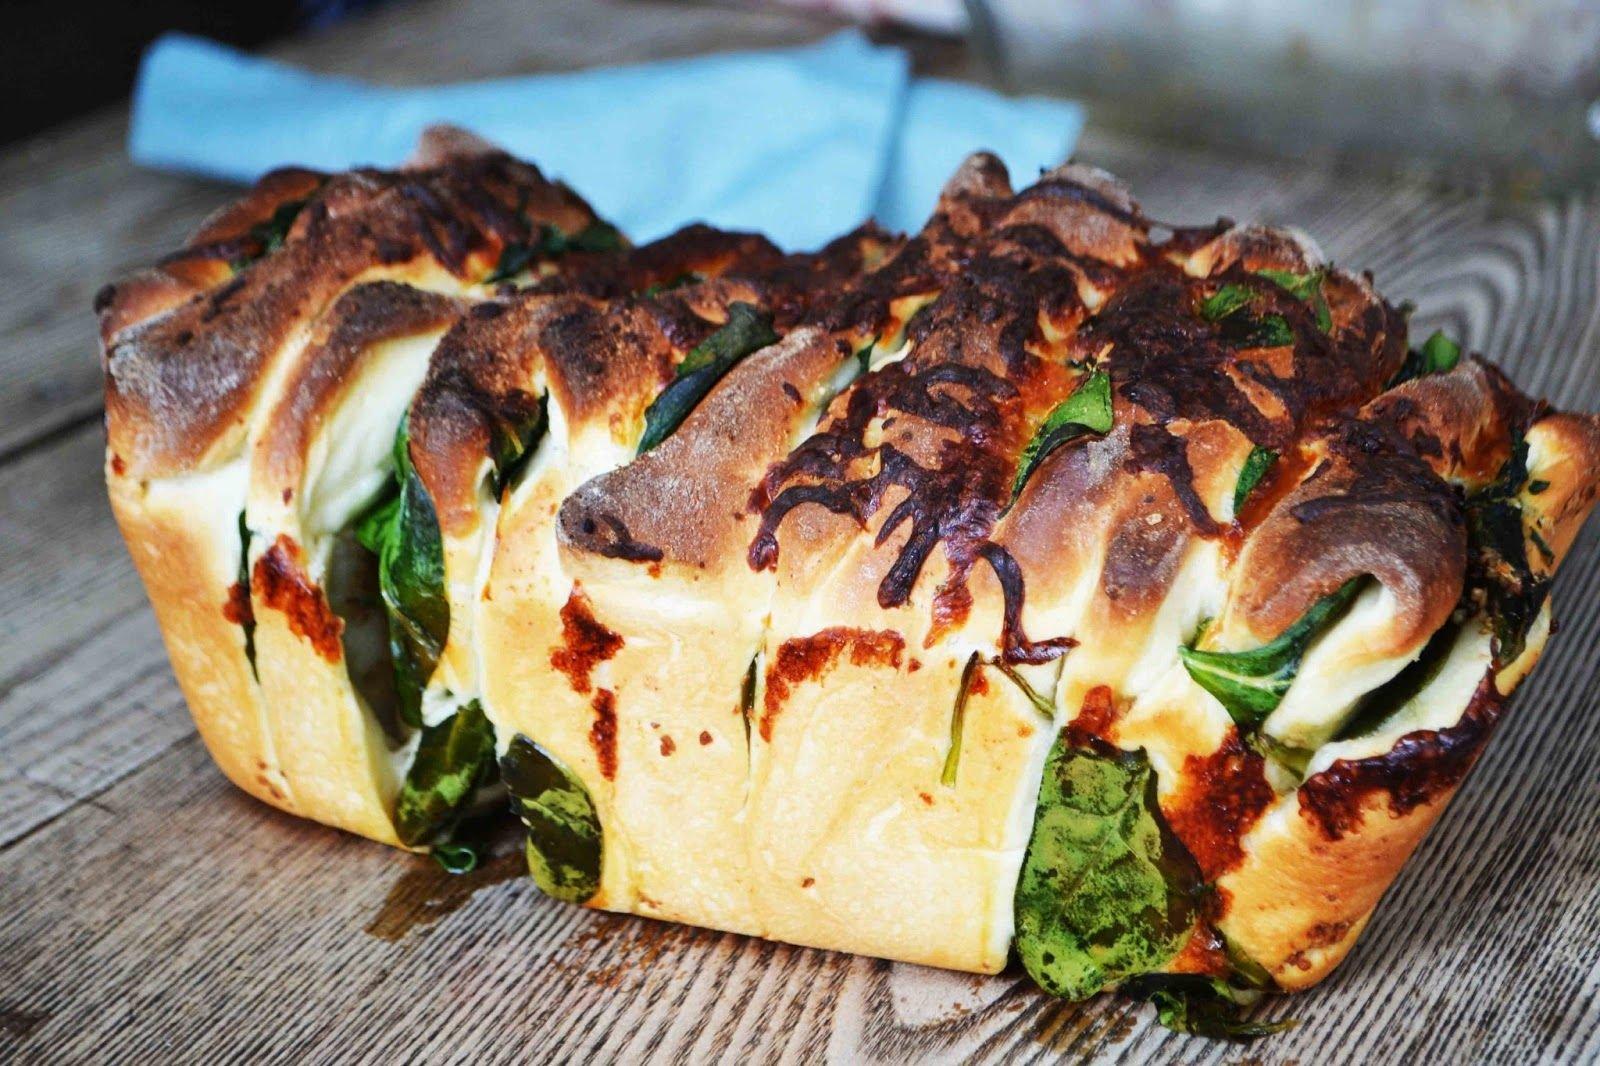 14 Homemade Bread Recipes to Inspire Your Inner Baker - Forkly